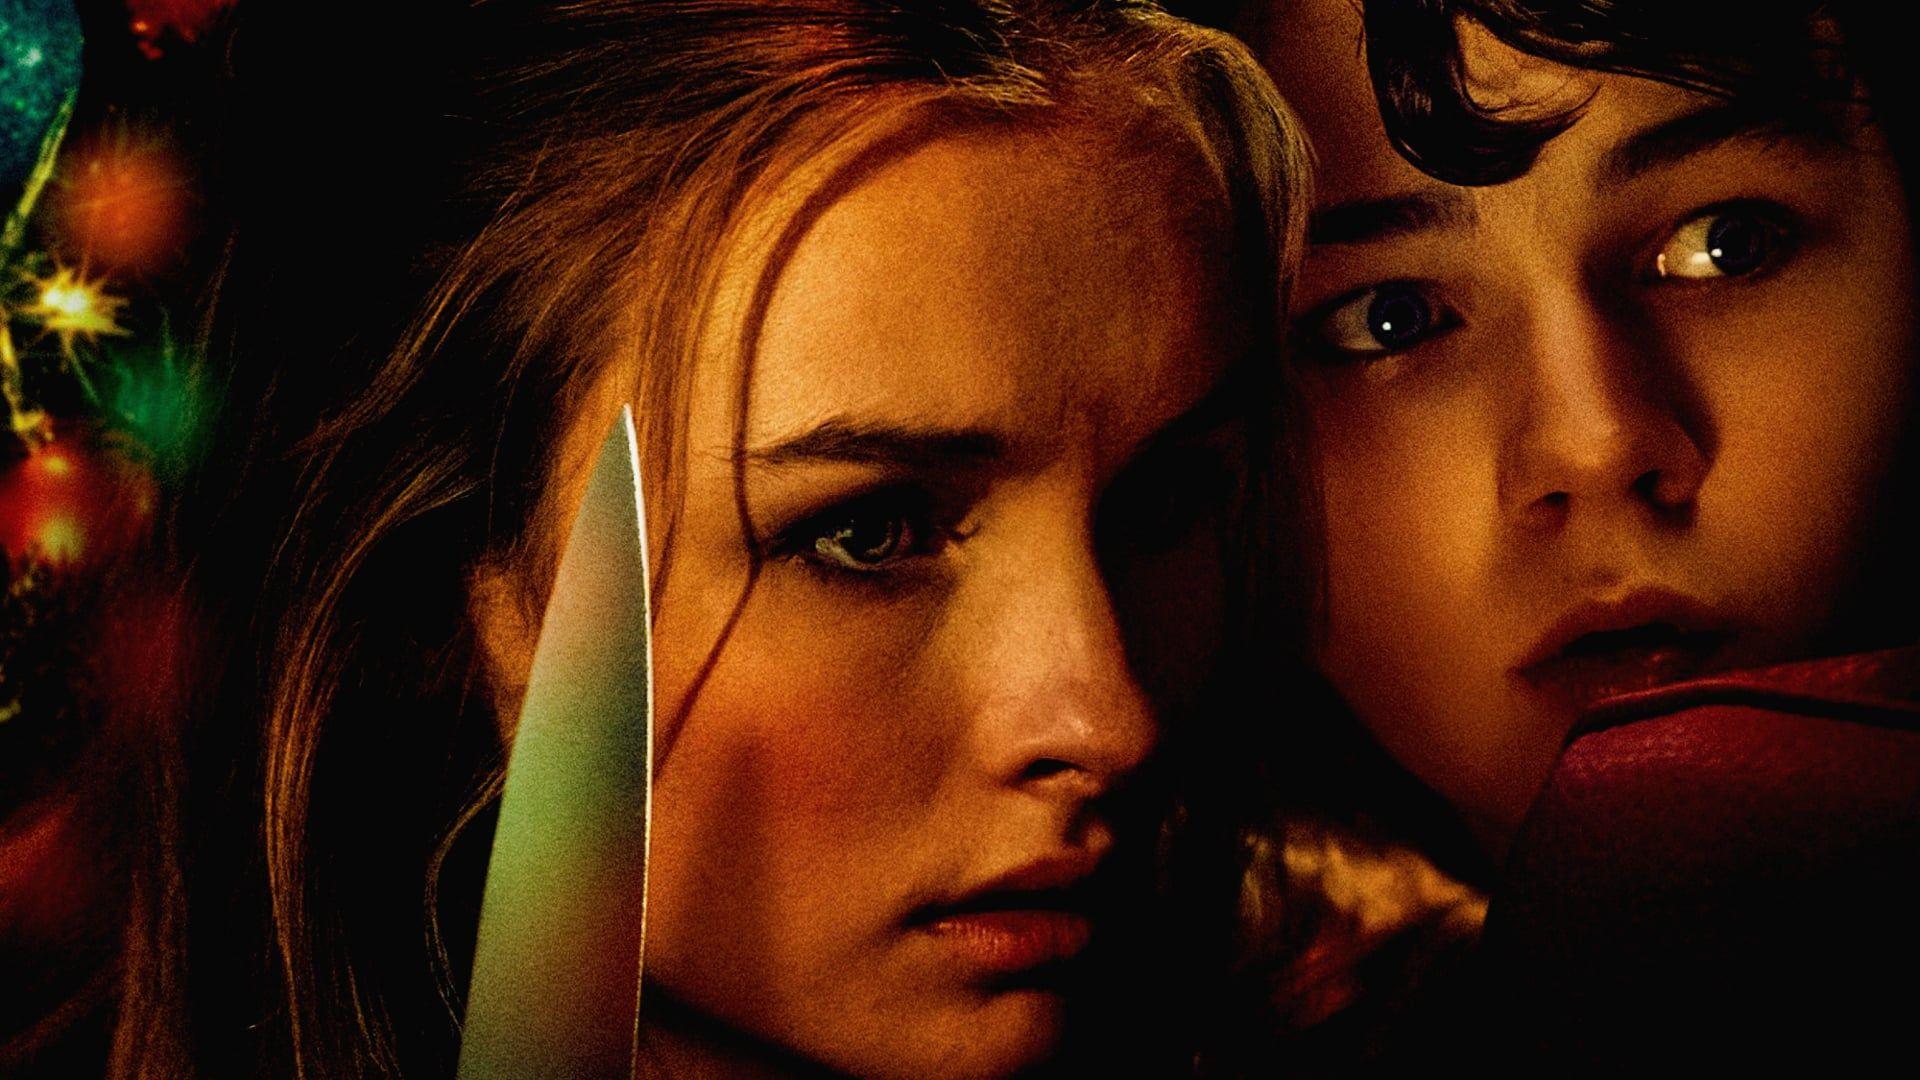 Better Watch Out 2016 Cb01 Completo Italiano Altadefinizione Cinema Guarda Better Watch Full Movies Online Free Free Movies Online Full Movies Online